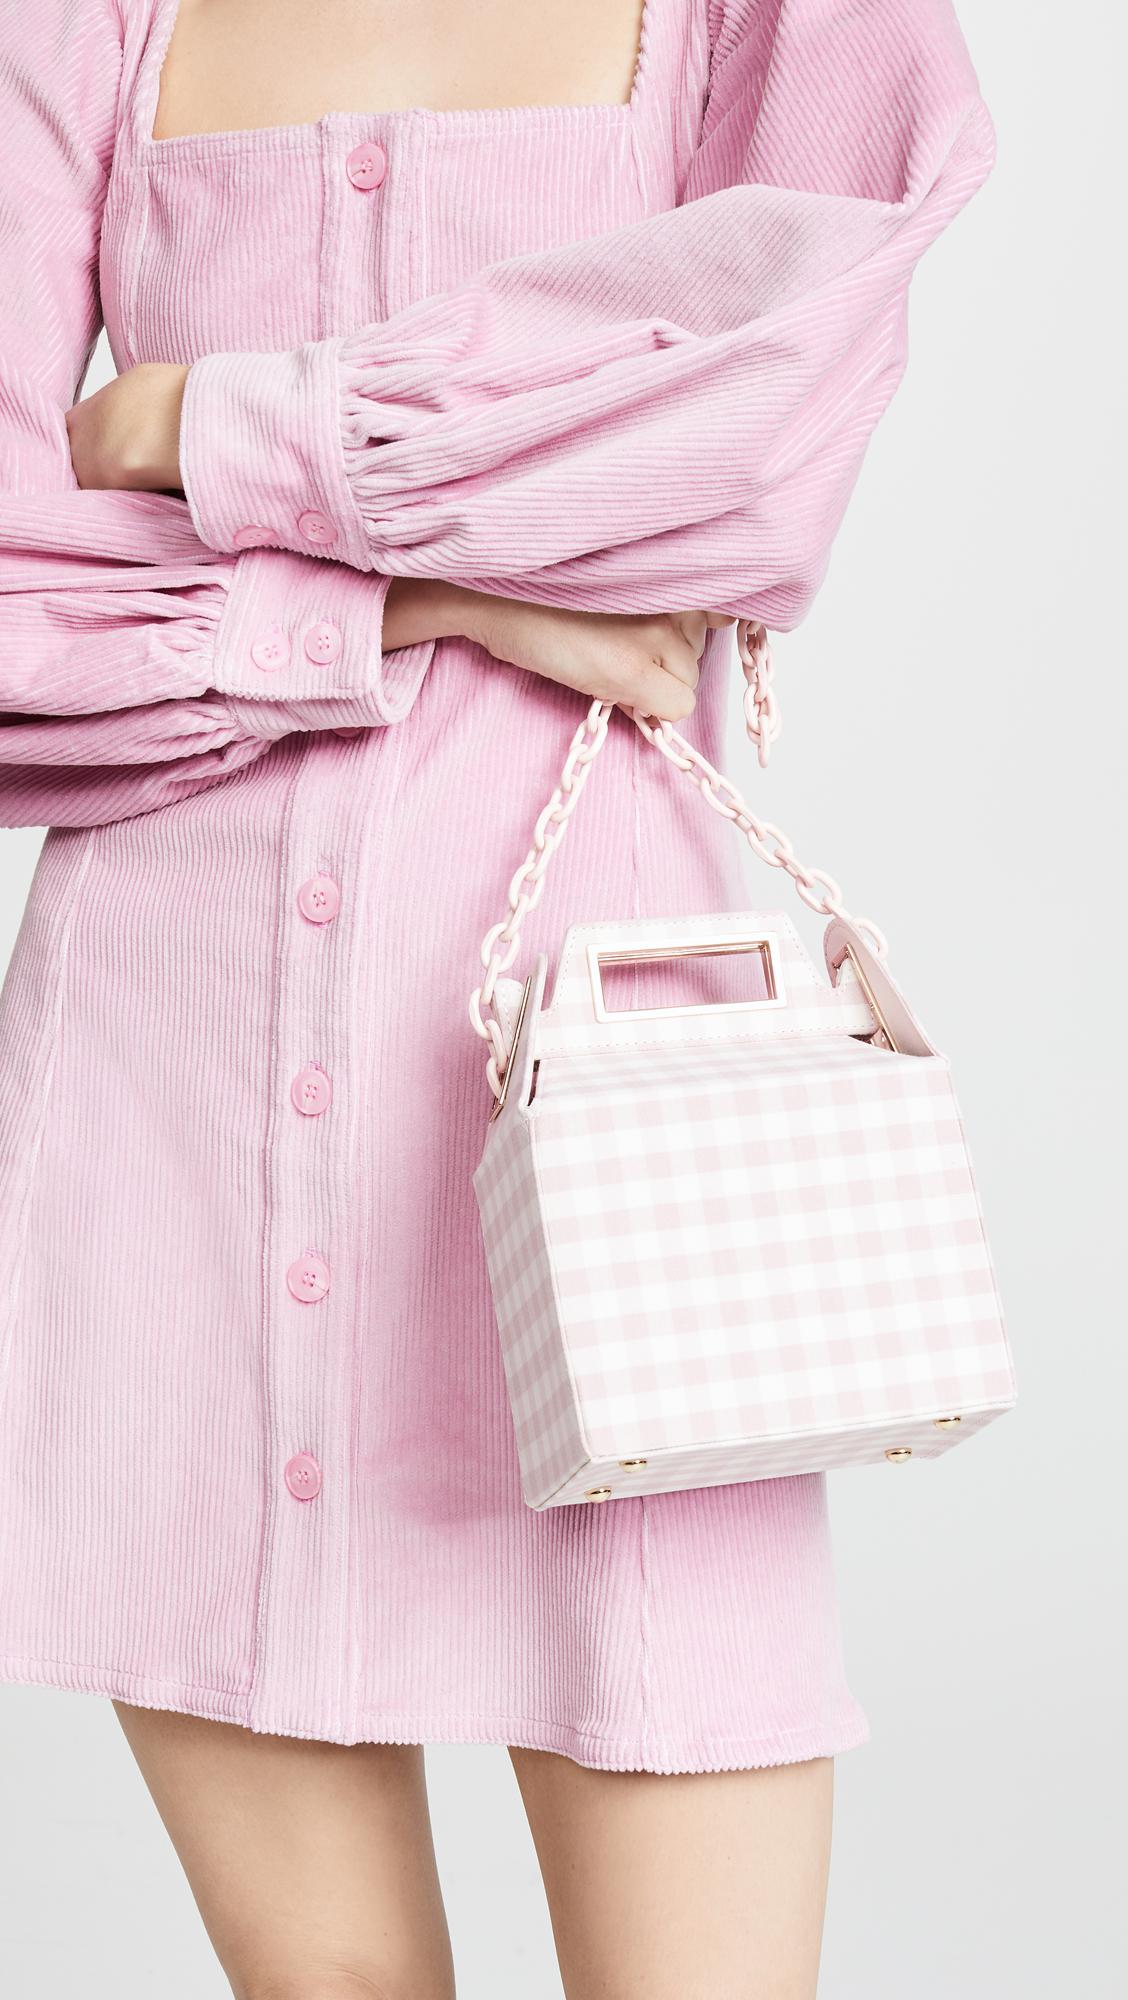 Pop & Suki Takeout Bag with Chain Strap | SHOPBOP